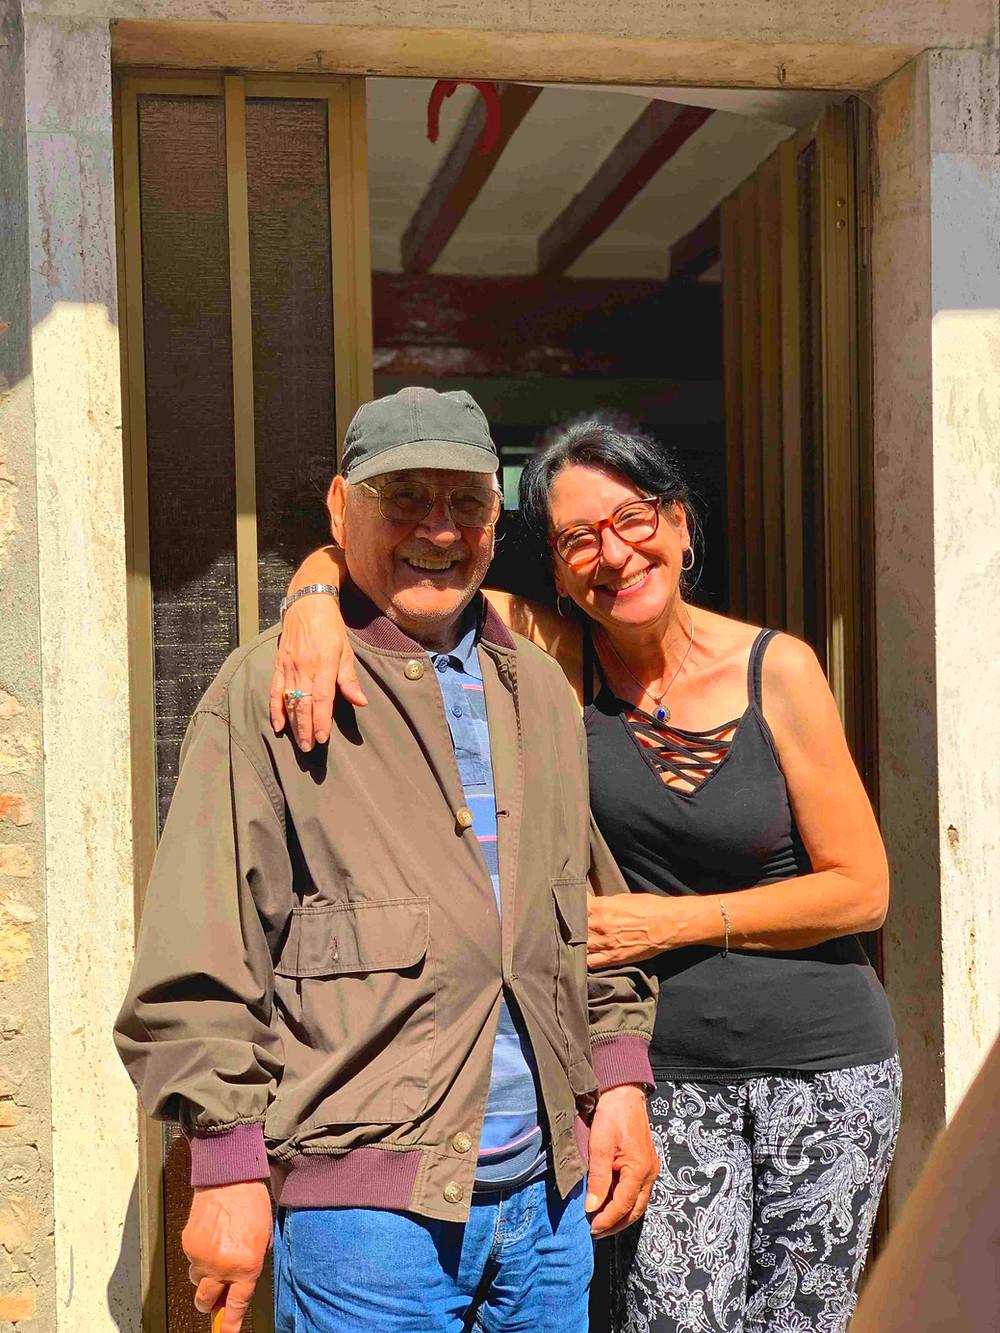 Guido and his daughter Marina of Scoppieto village, Umbria, Italy